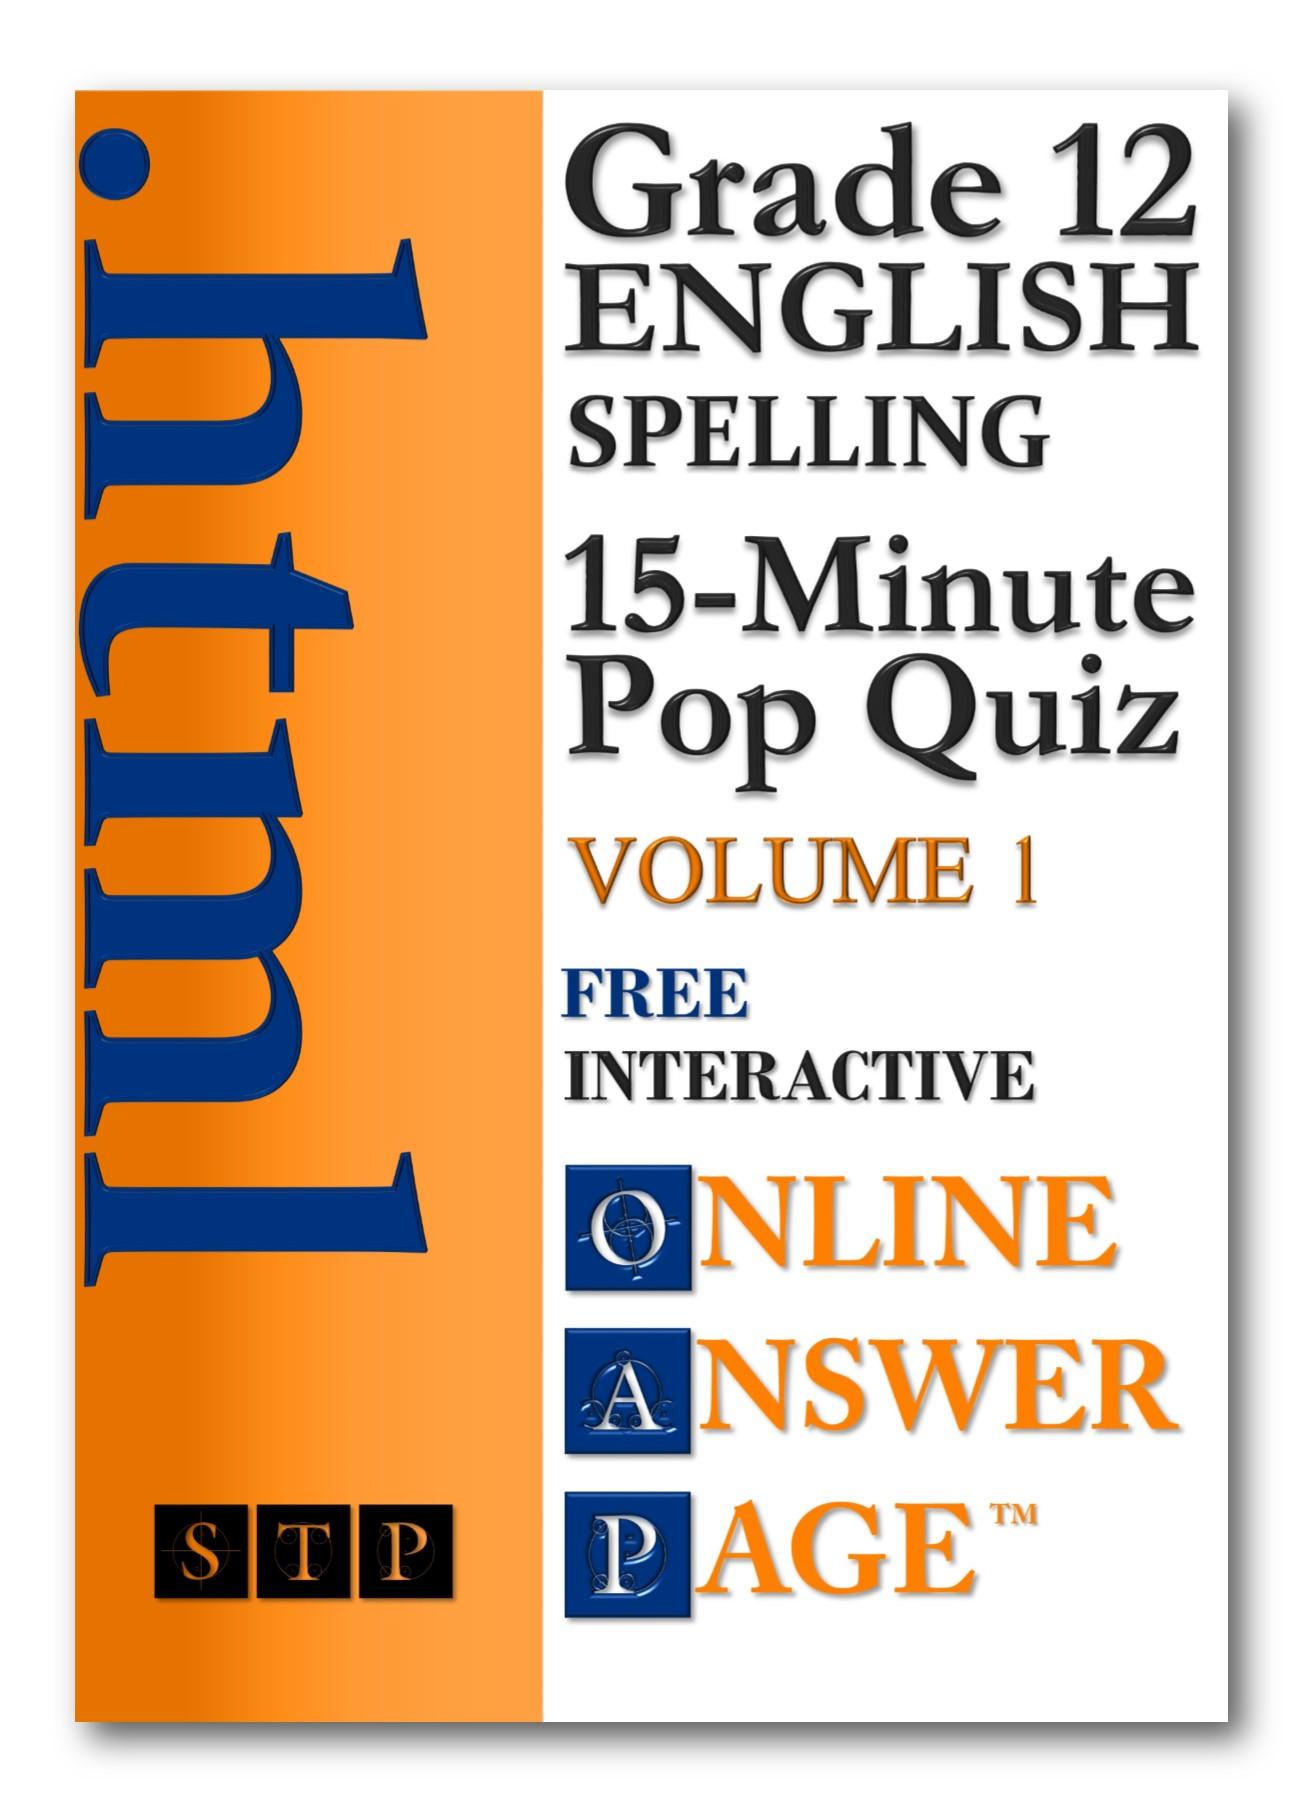 OAP Grade12 Spelling Vol.01 Gallery (11.12.15) 02.01.jpg